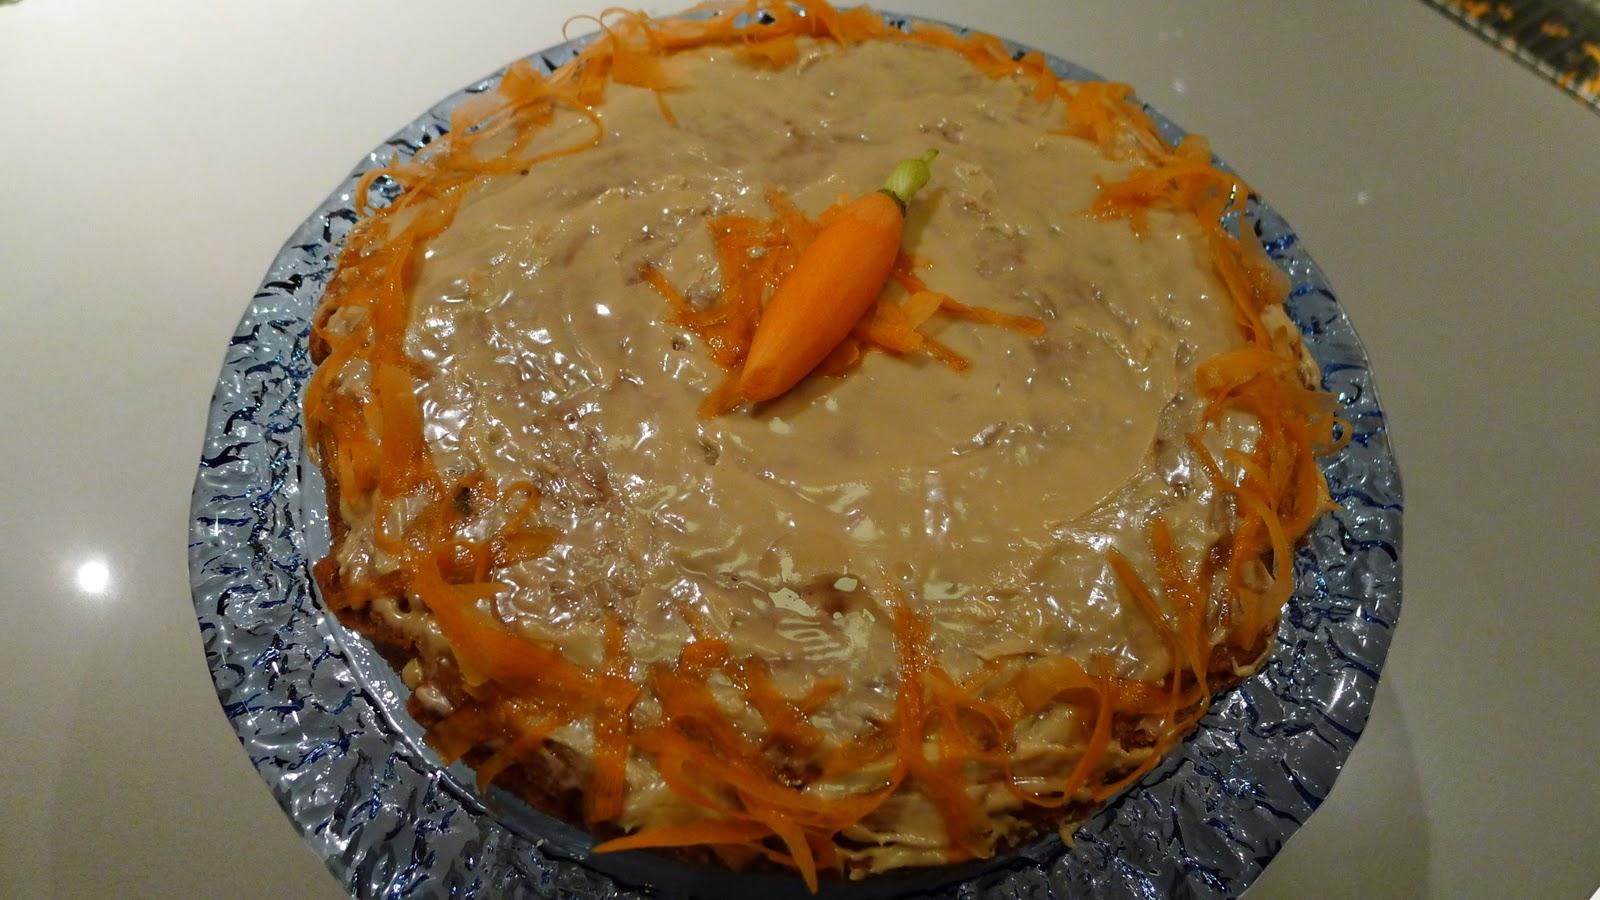 Can You Buy Vegan Carrott Cake